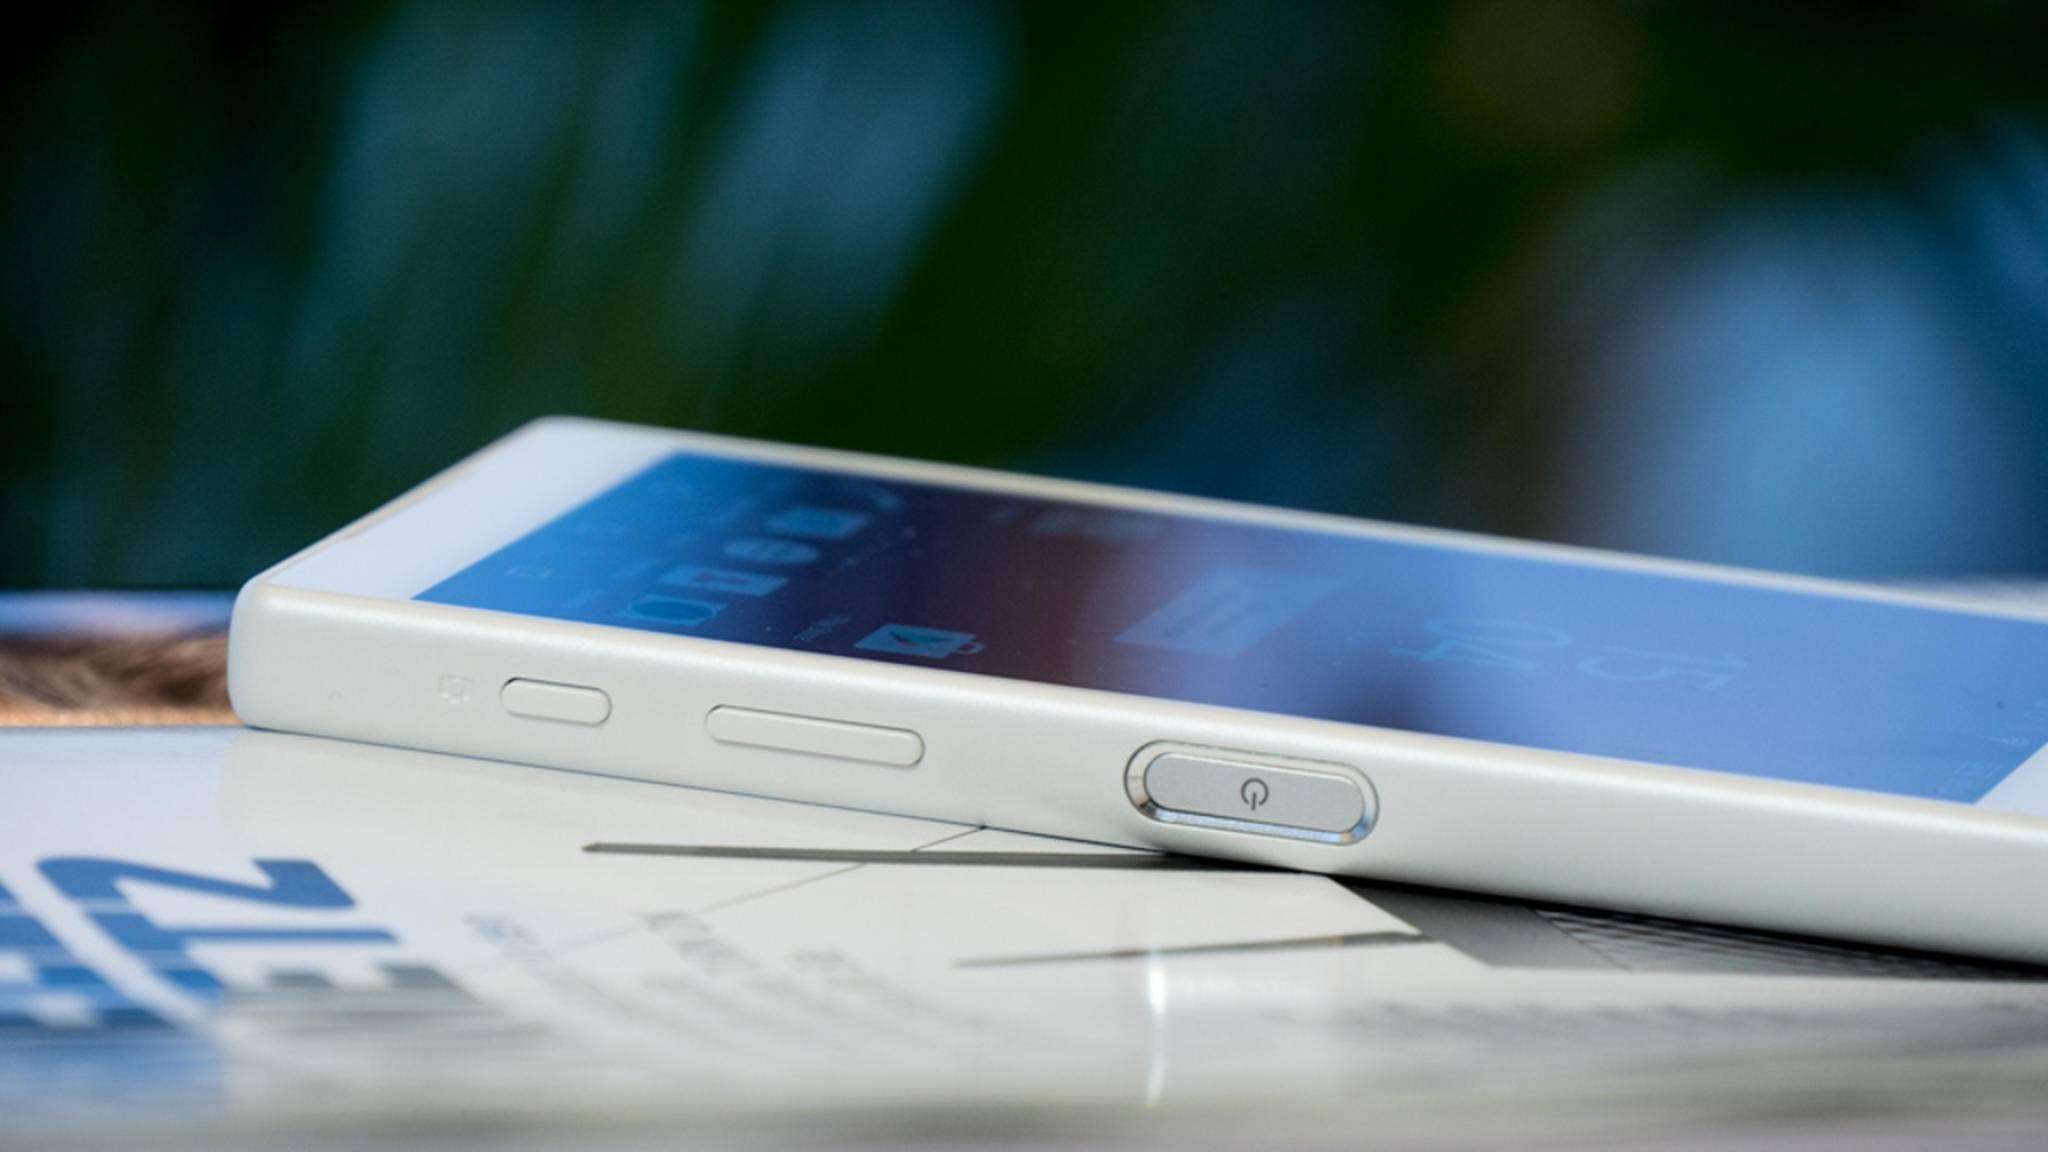 Das Xperia XZ1 Compact soll wieder so handlich wie das Xperia Z5 Compact werden.